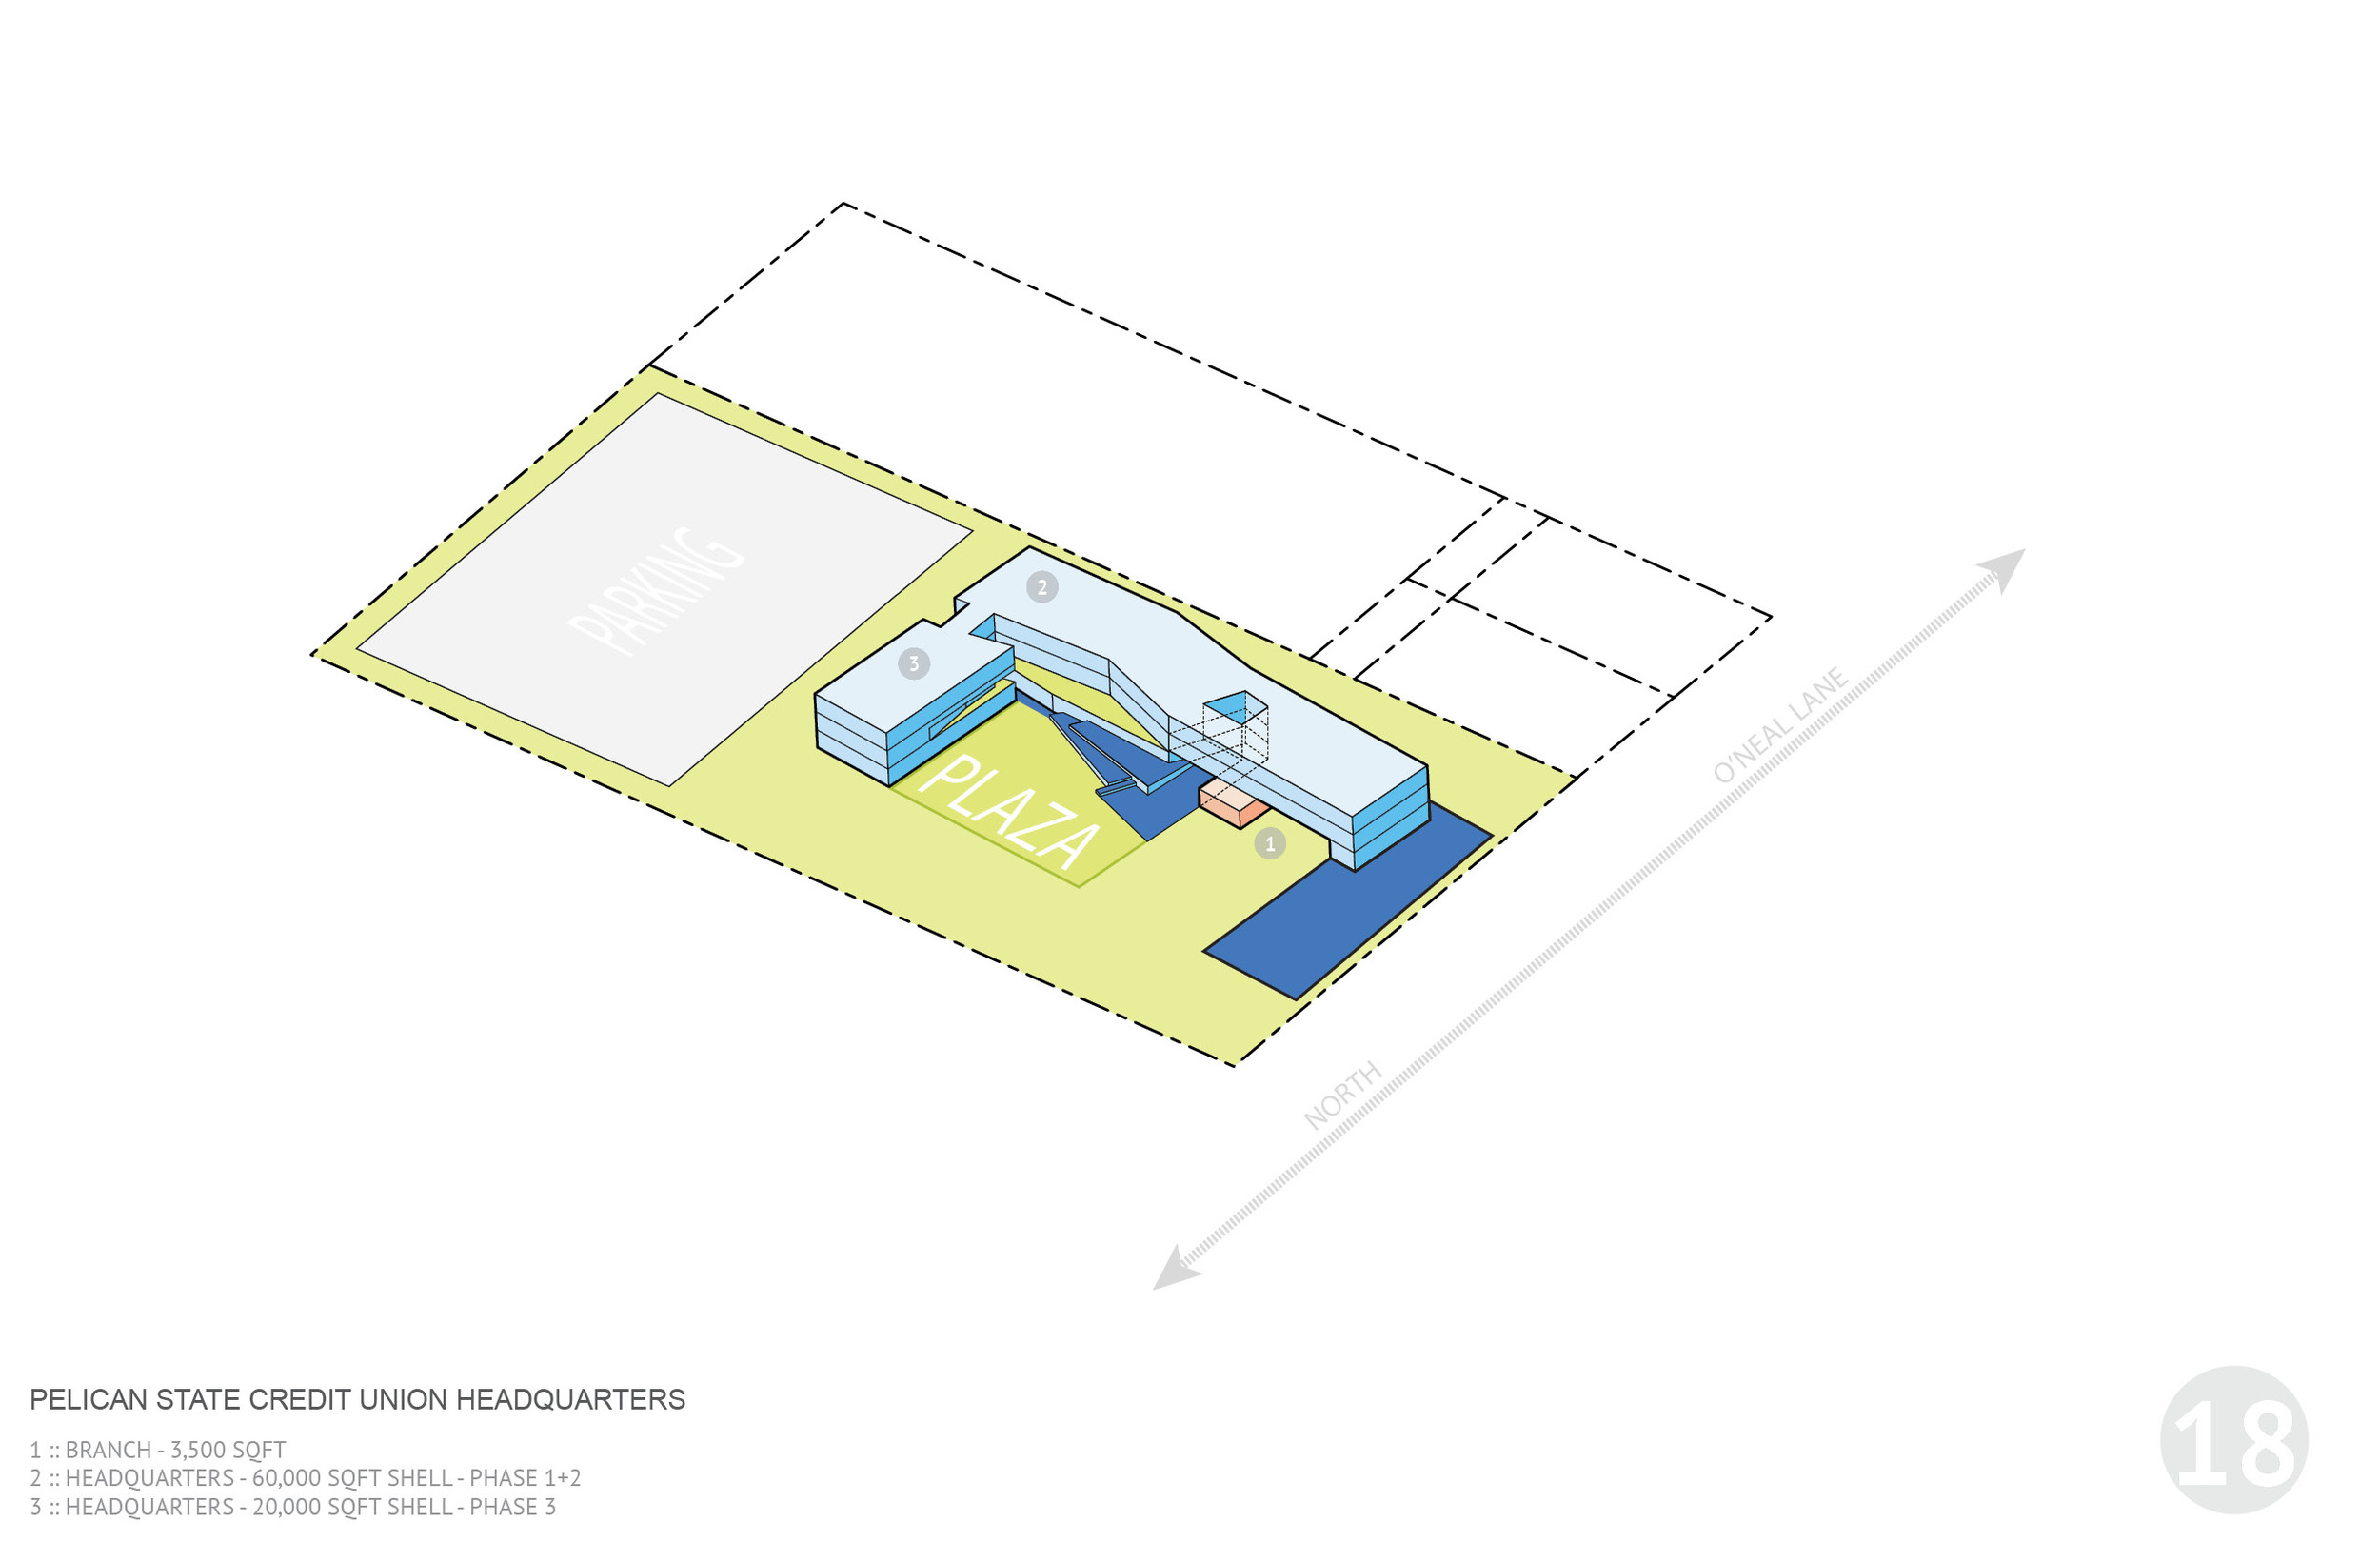 A_SlideshowDiagram_18.jpg